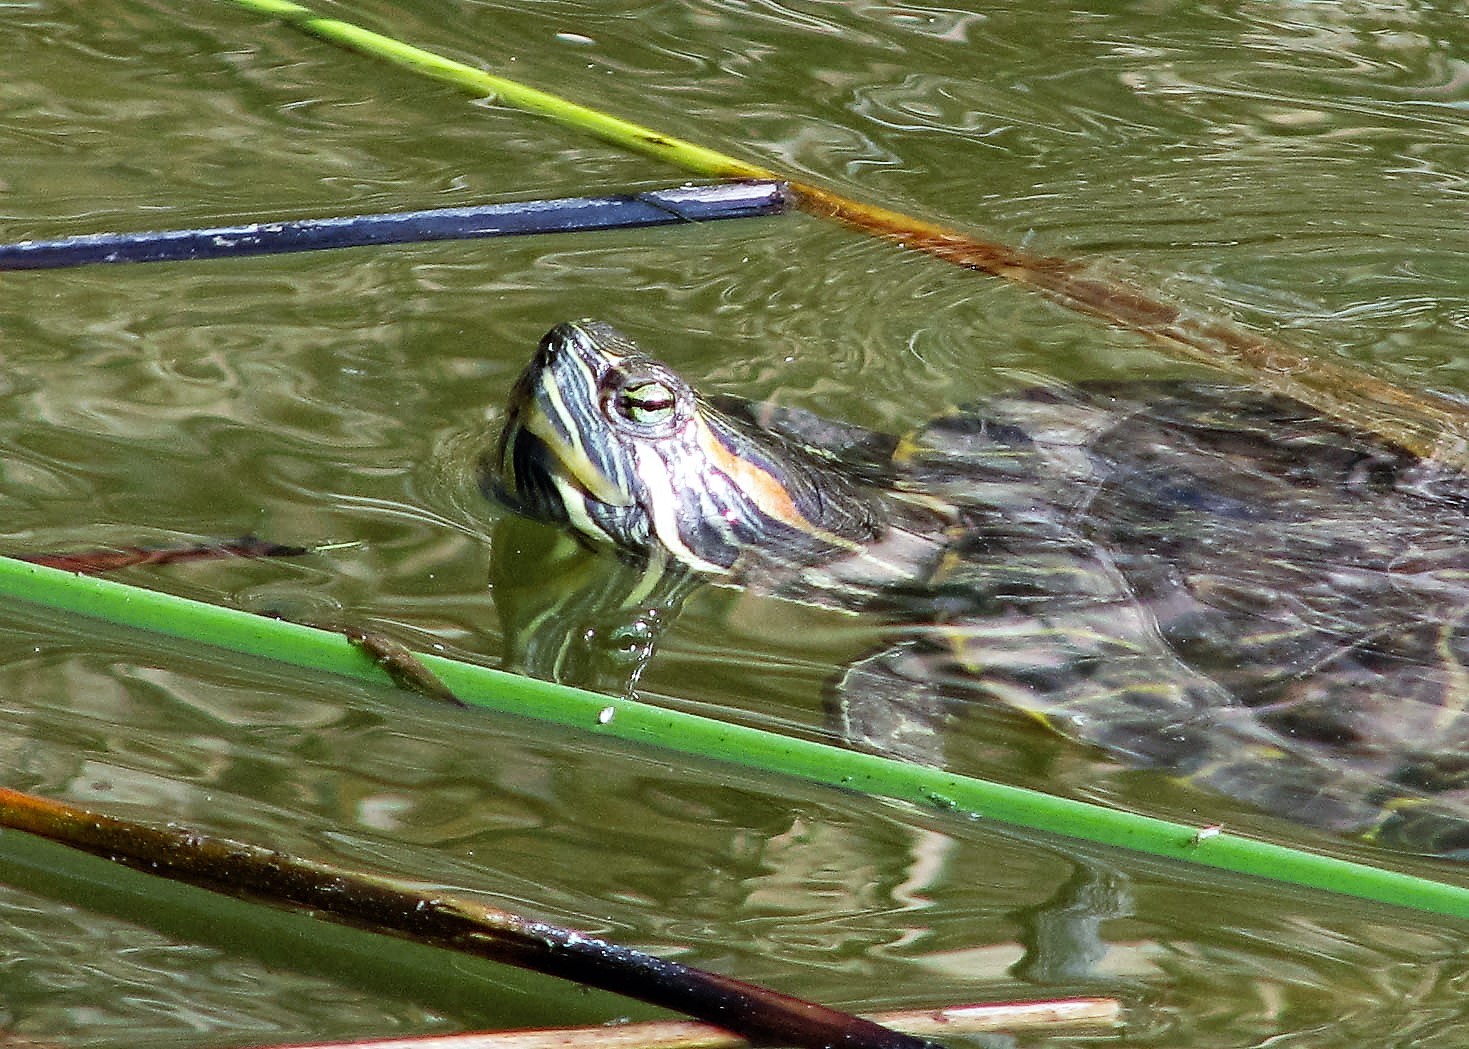 Turtles, Gilbert AZ